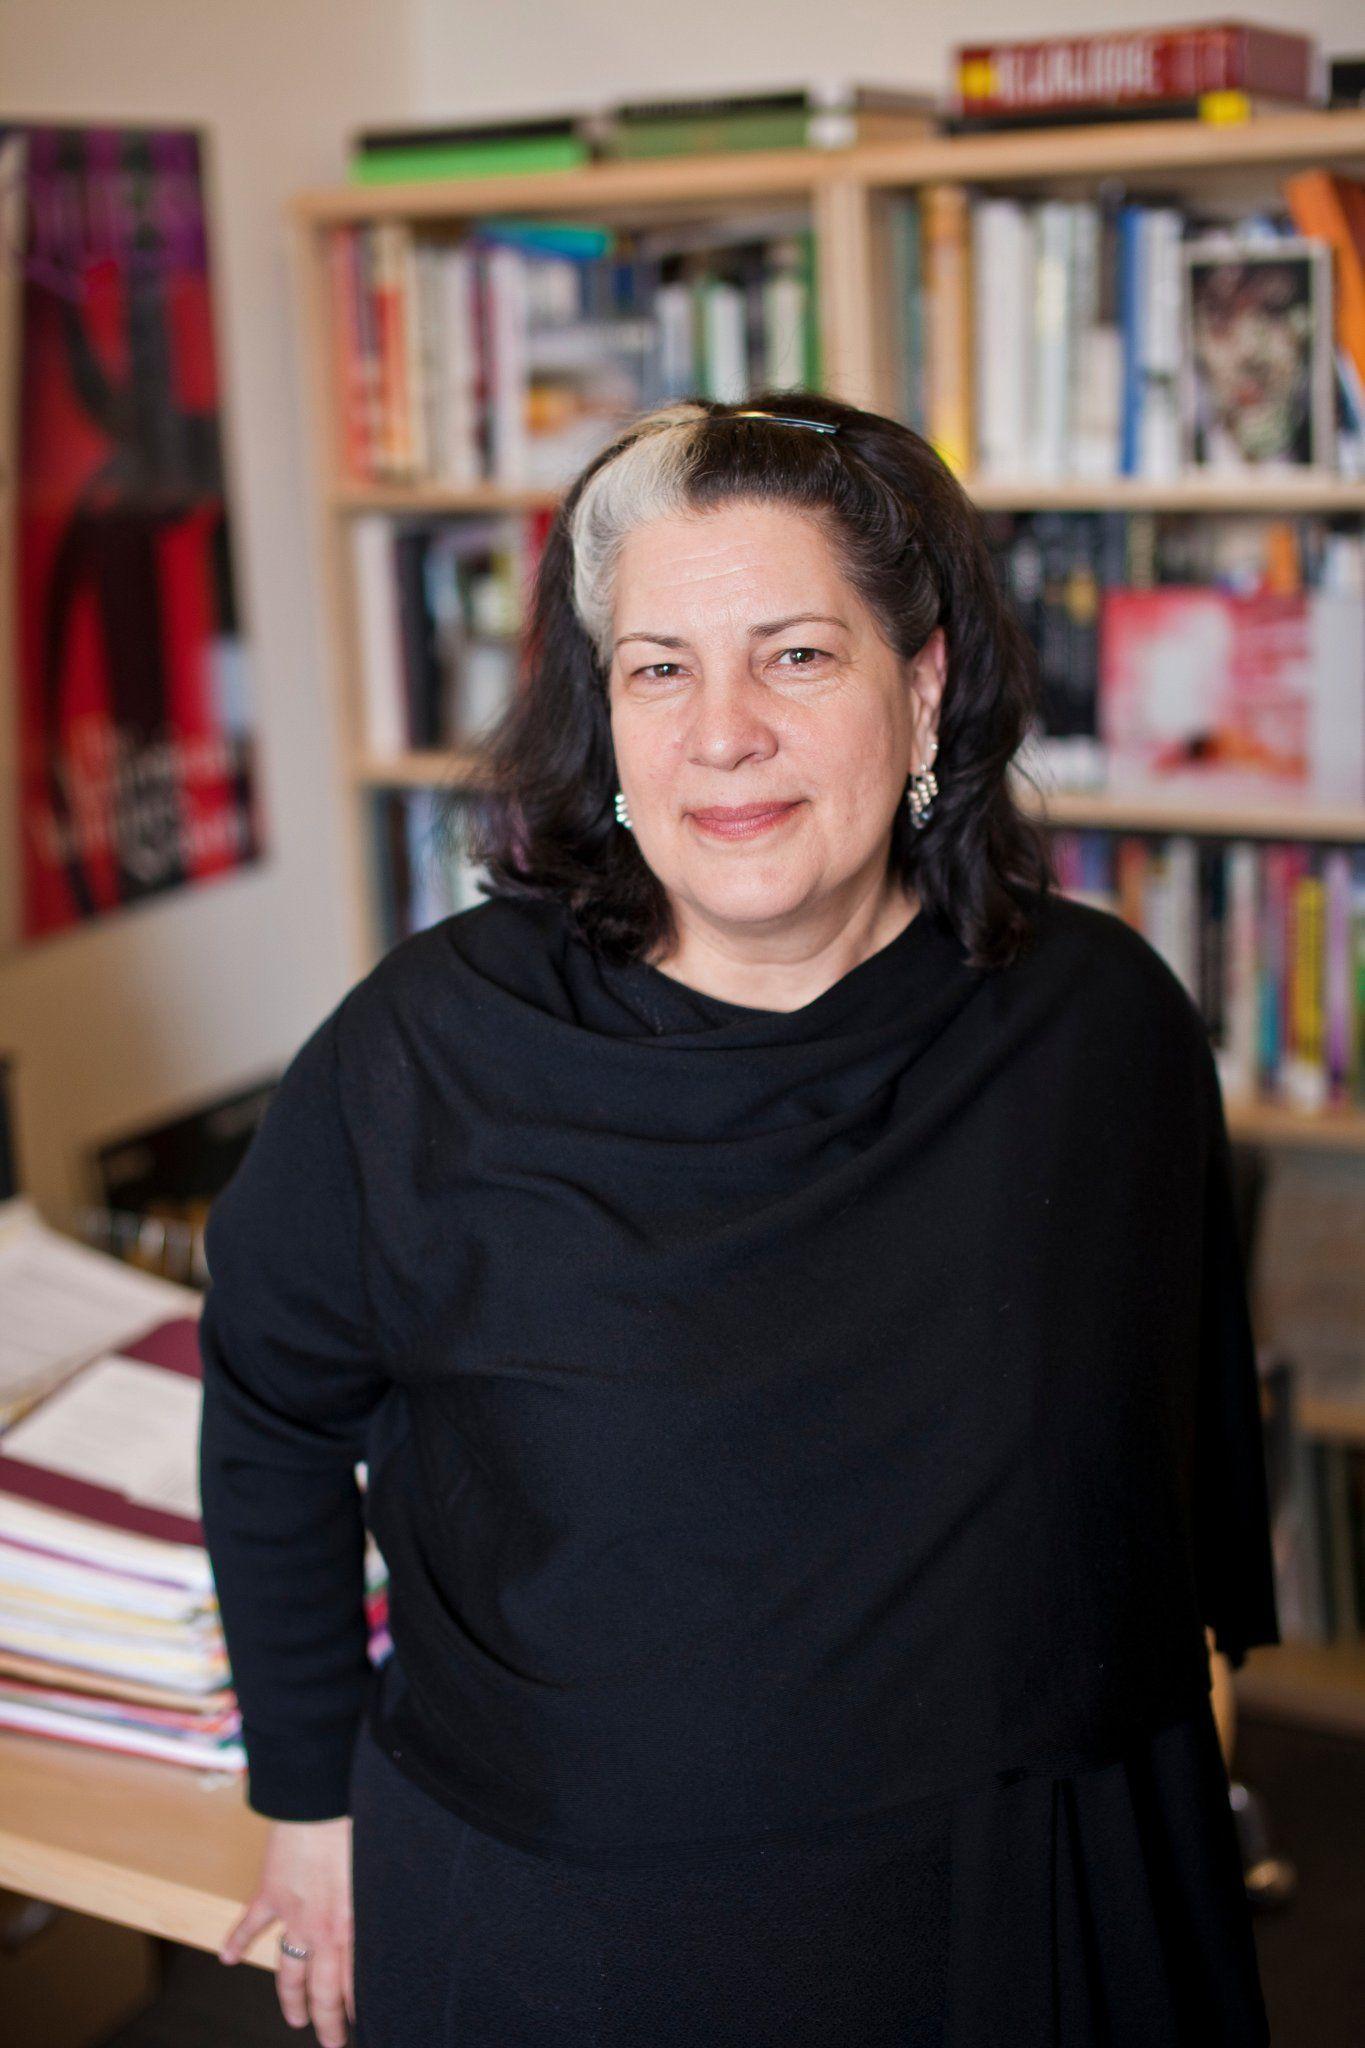 Tina Oldknow